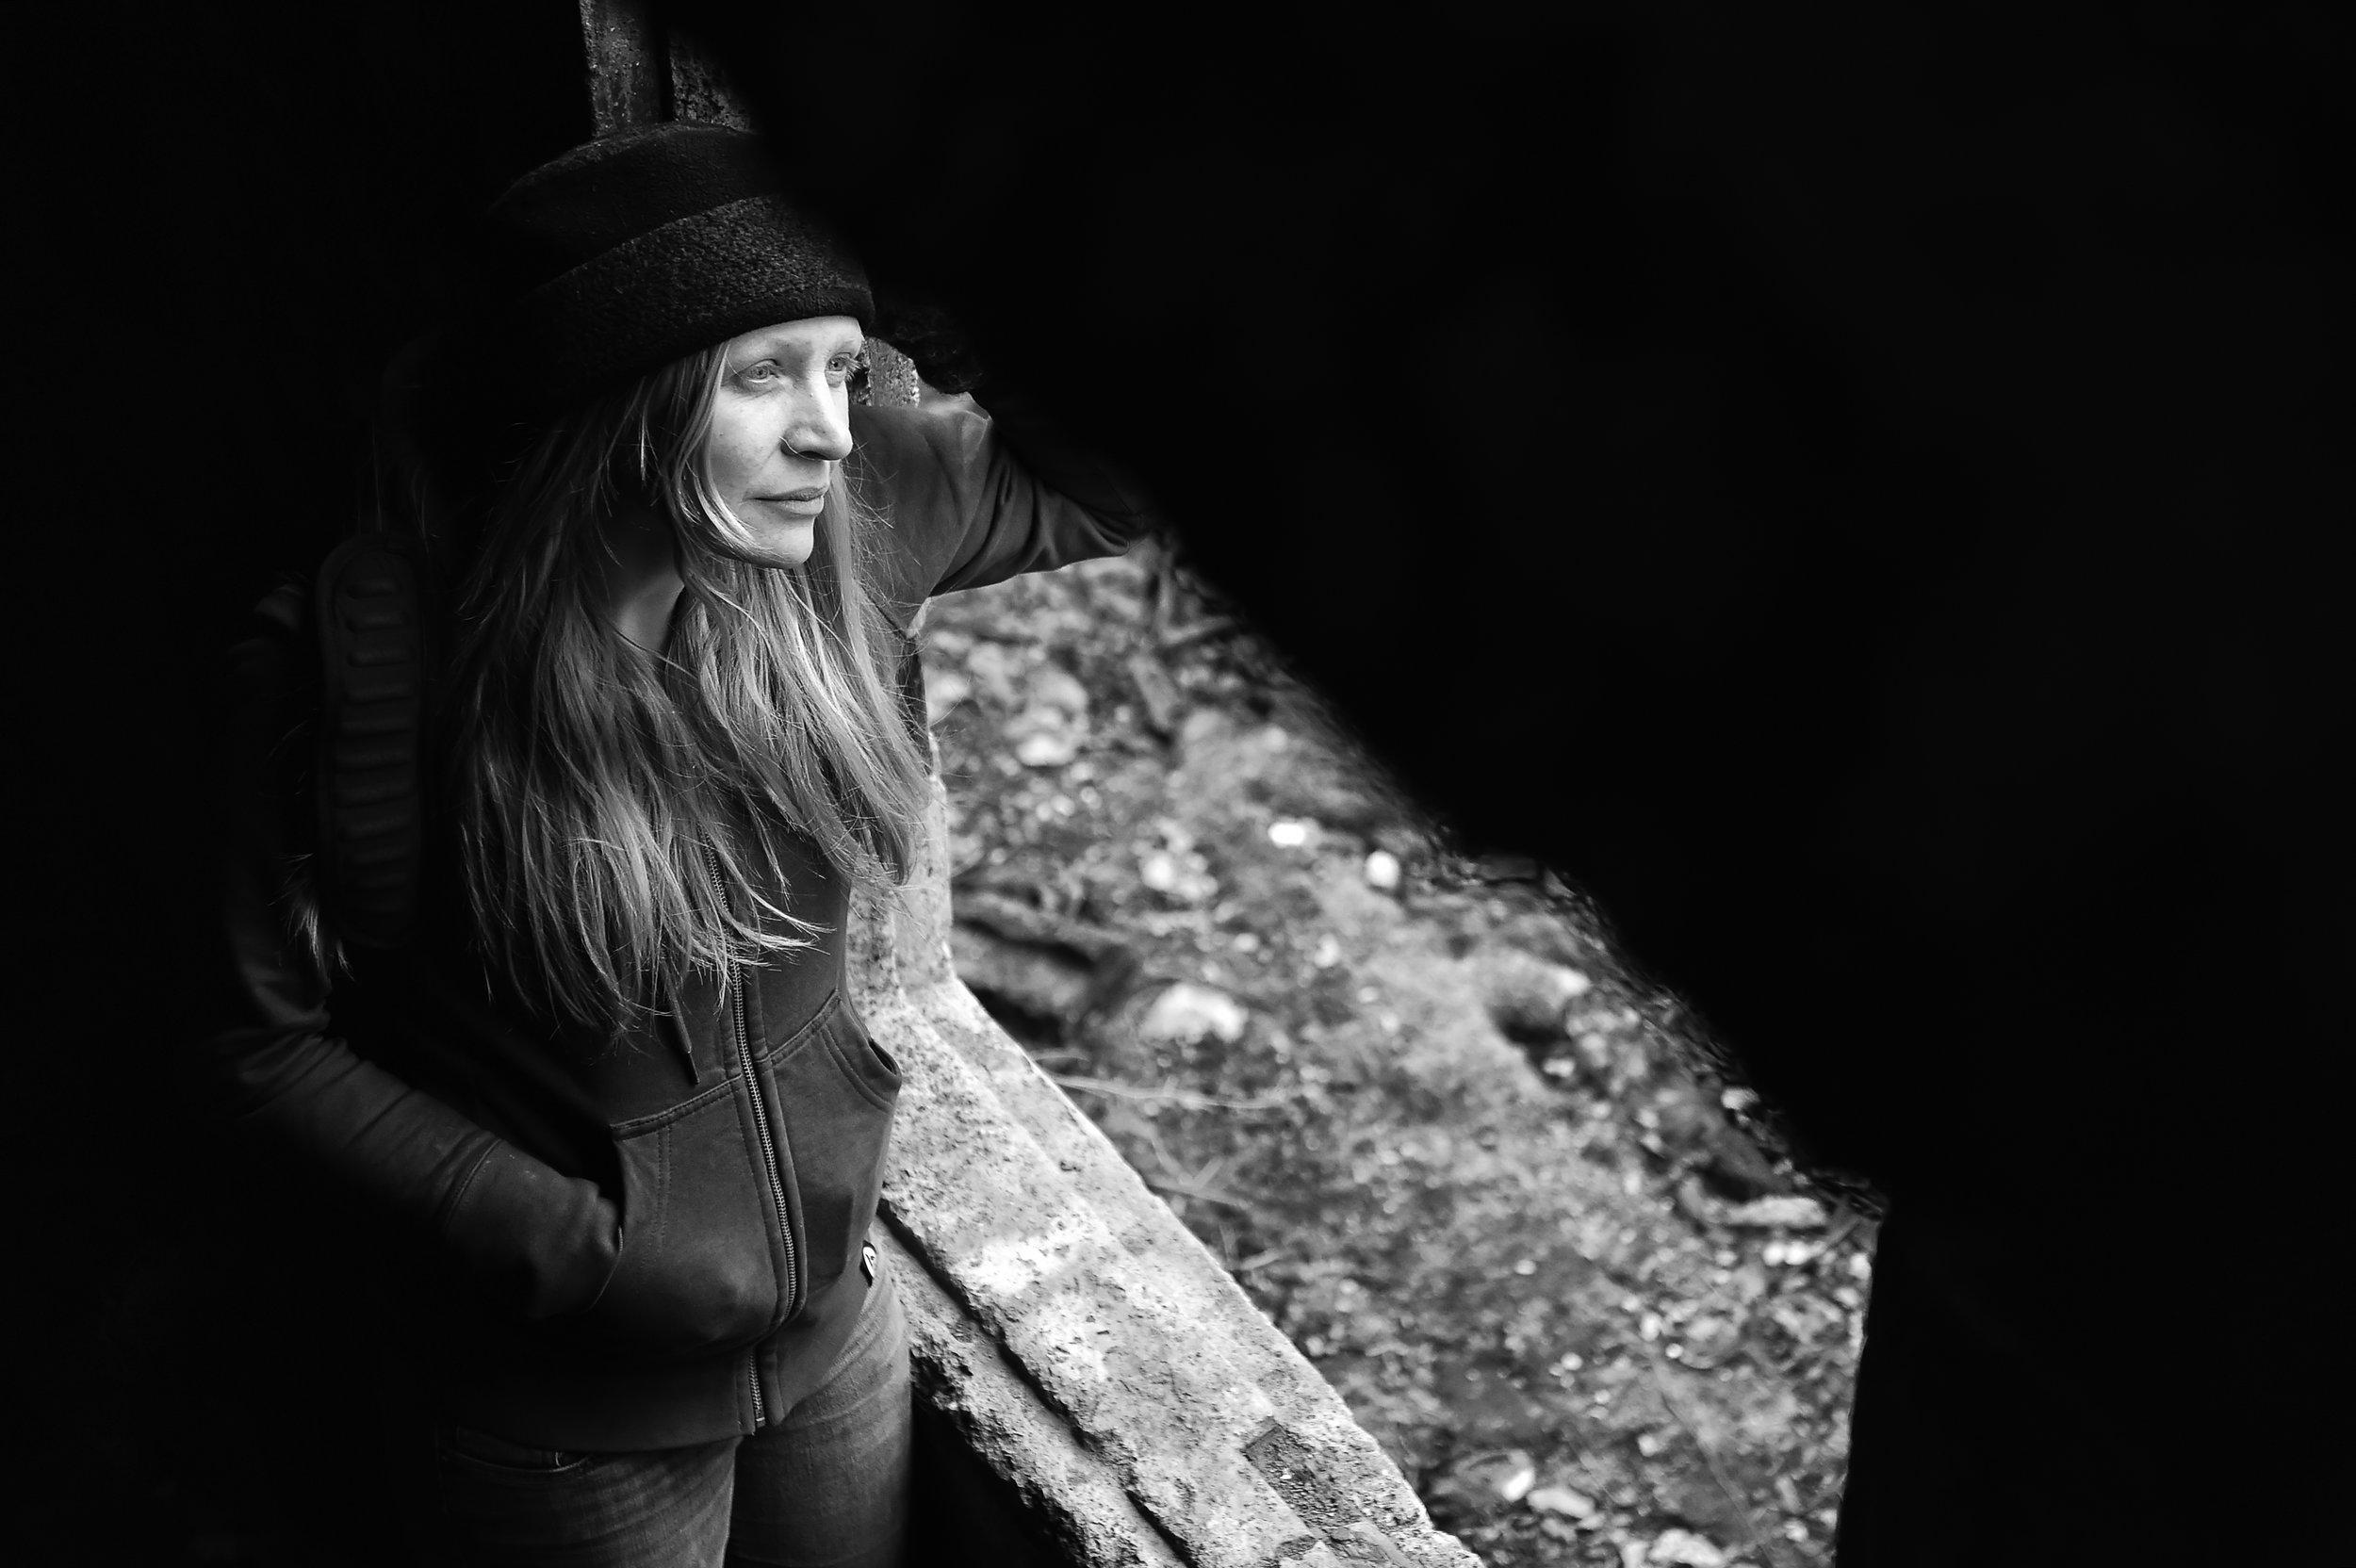 Amanda Hrycyna - photographer, creative mastermind